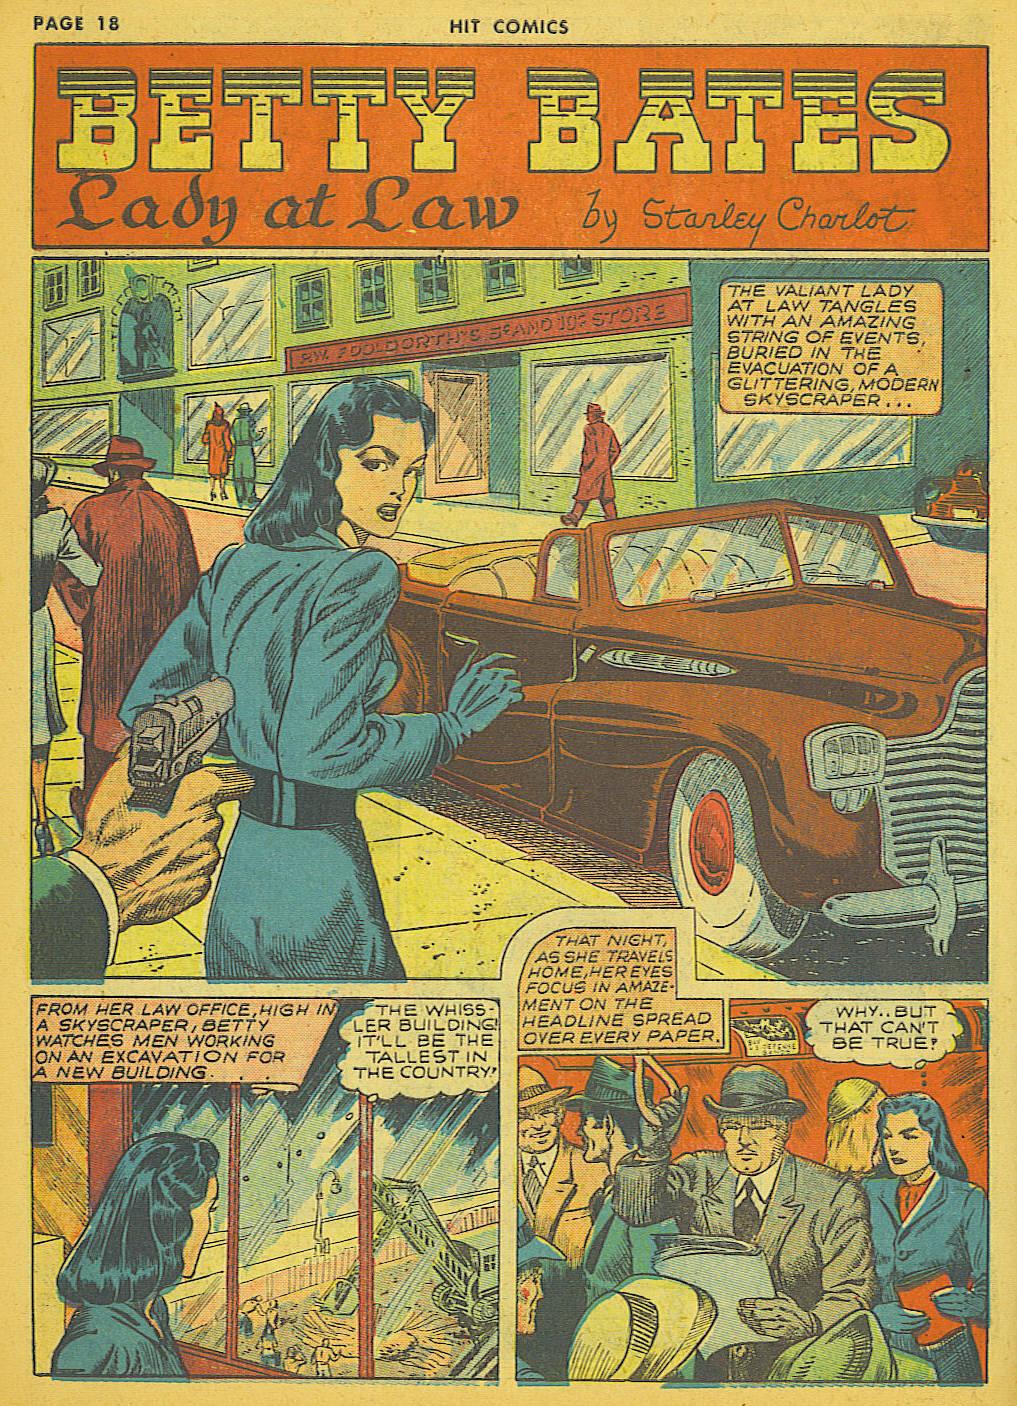 Read online Hit Comics comic -  Issue #21 - 20